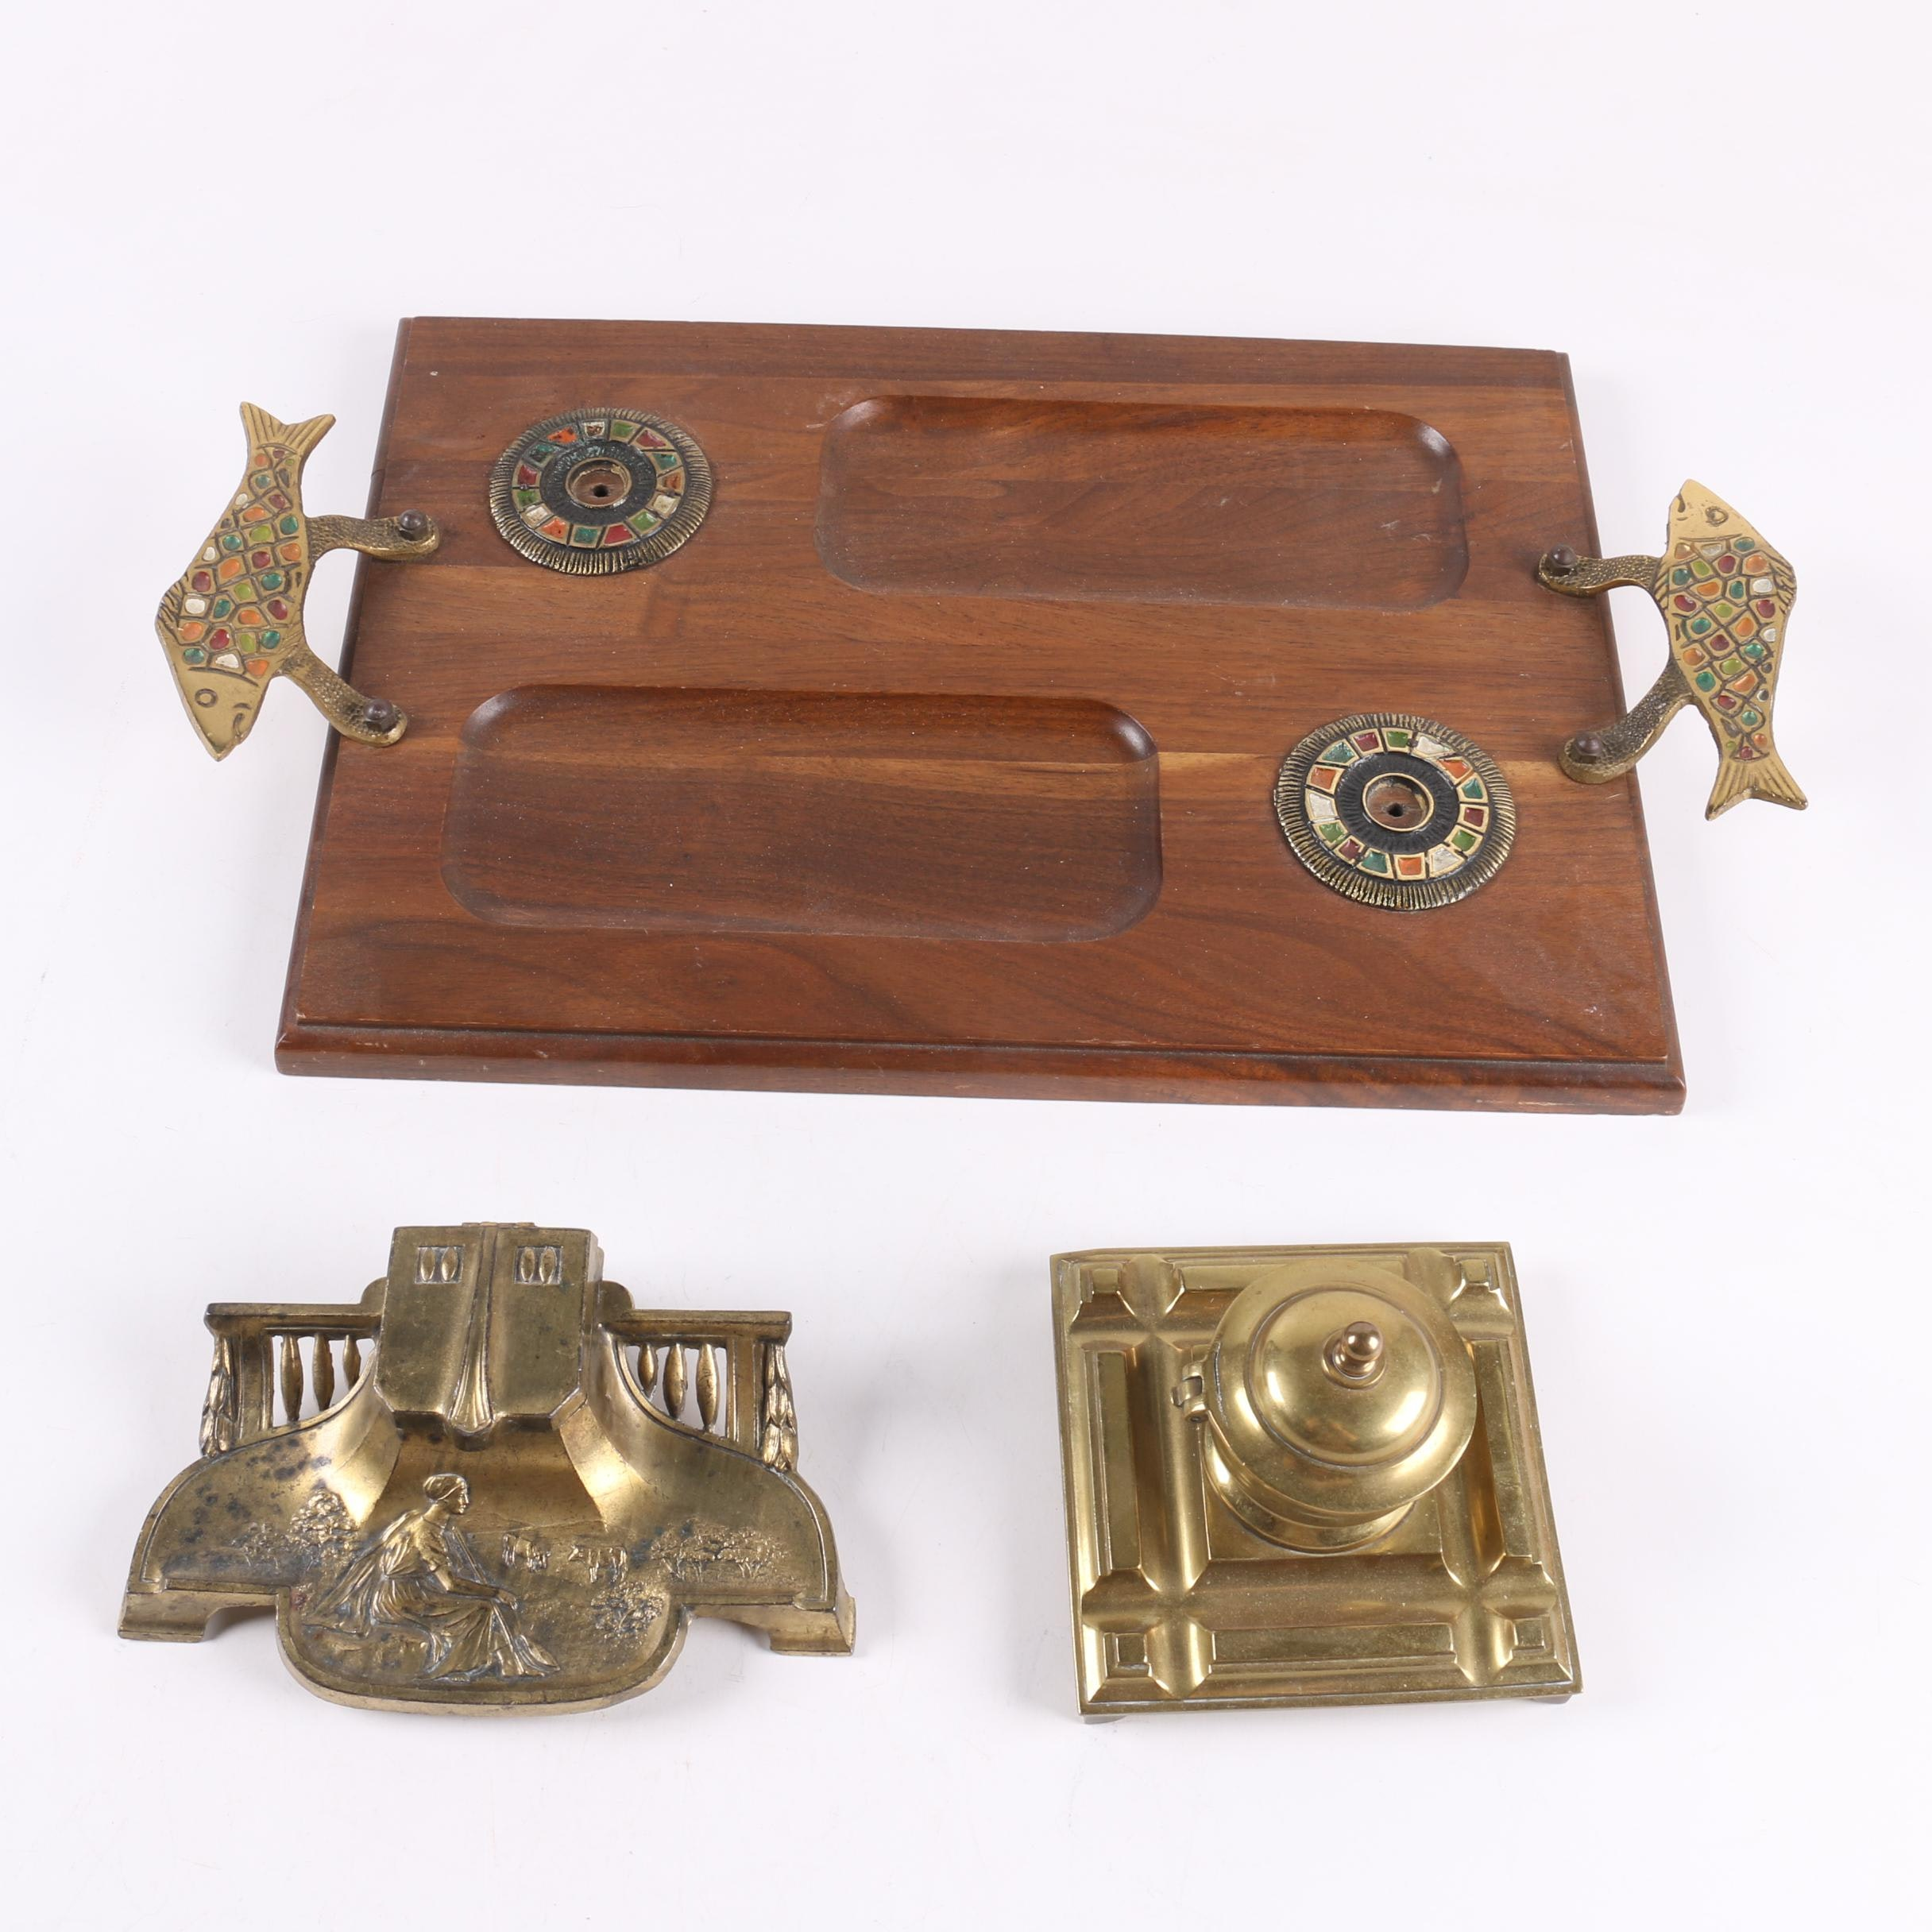 Desk Accessories Including Vintage Inkwells